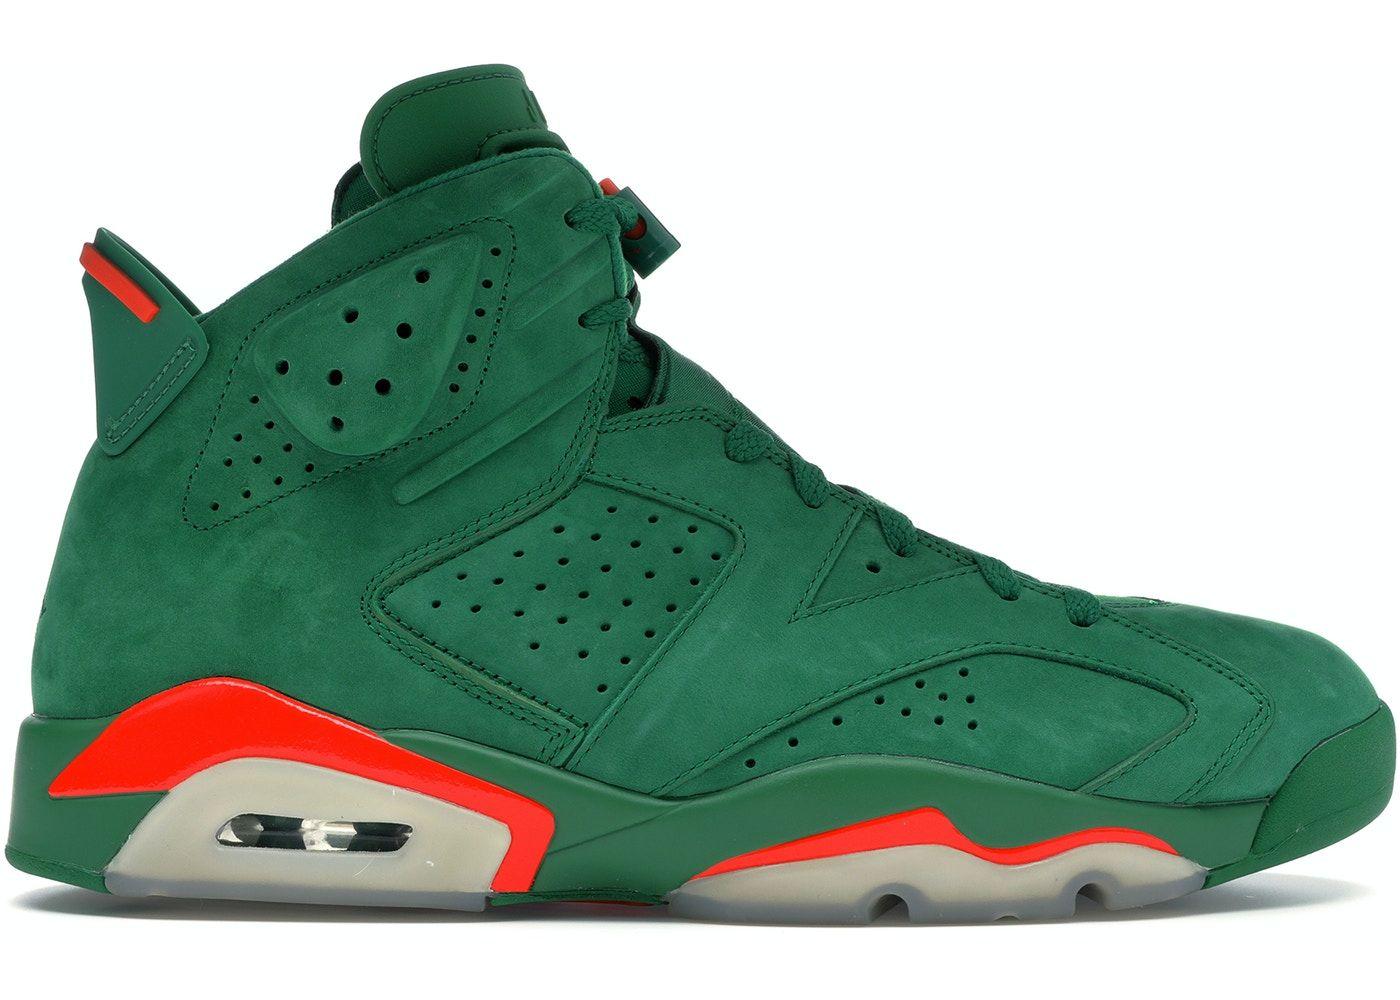 Jordan 6 Retro Gatorade Green in 2020